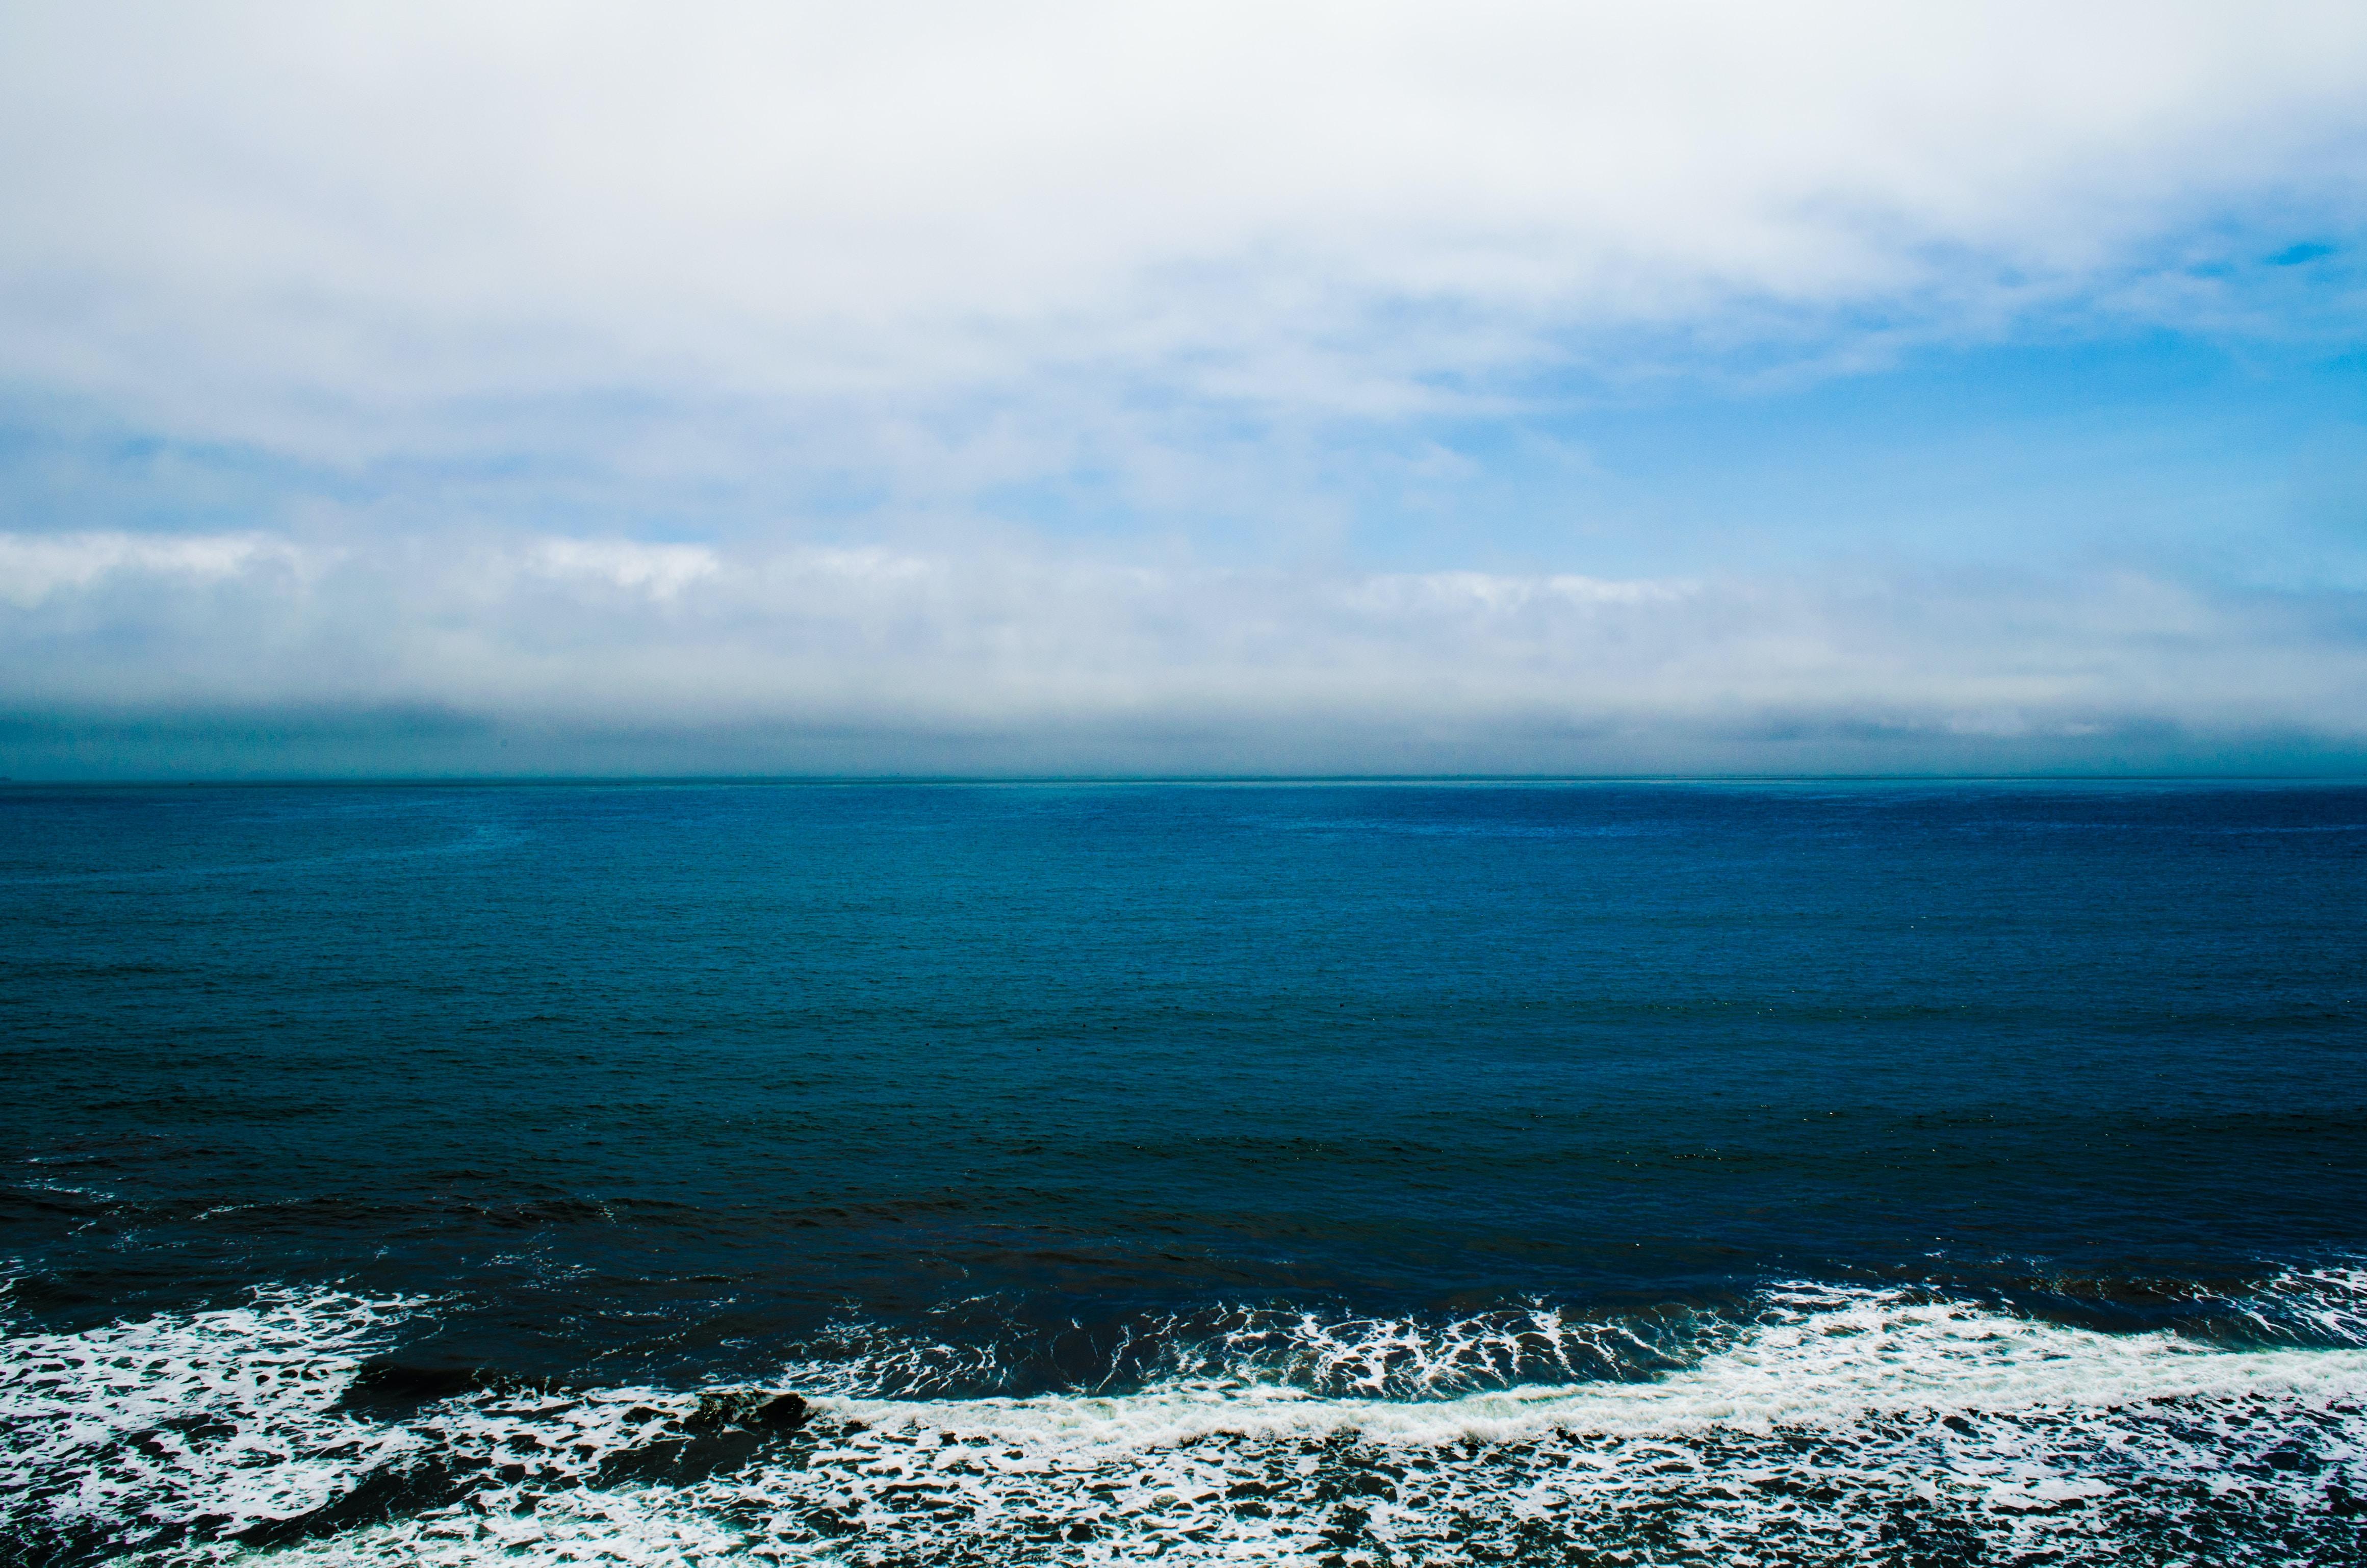 Drone view of the ocean horizon at Stinson Beach